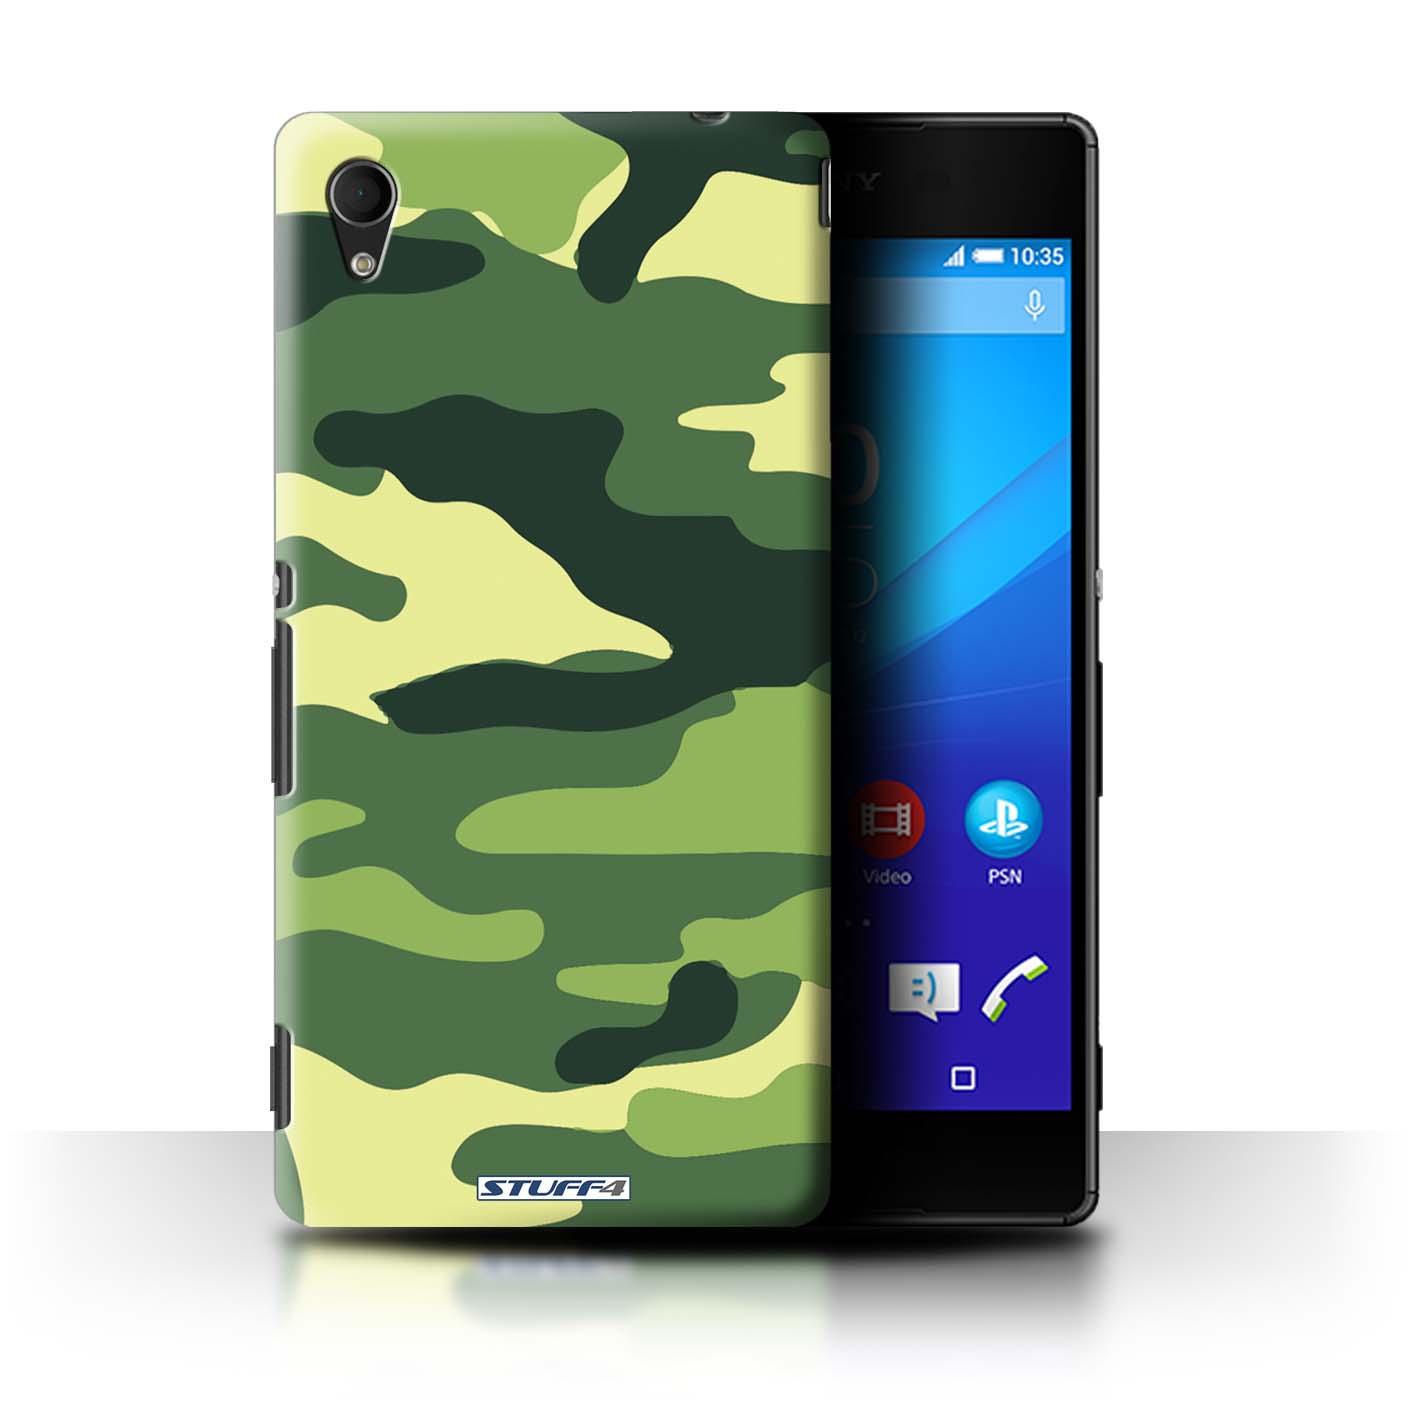 Coque-Etui-Housse-de-Stuff4-pour-Sony-Xperia-M4-Aqua-Armee-Camouflage